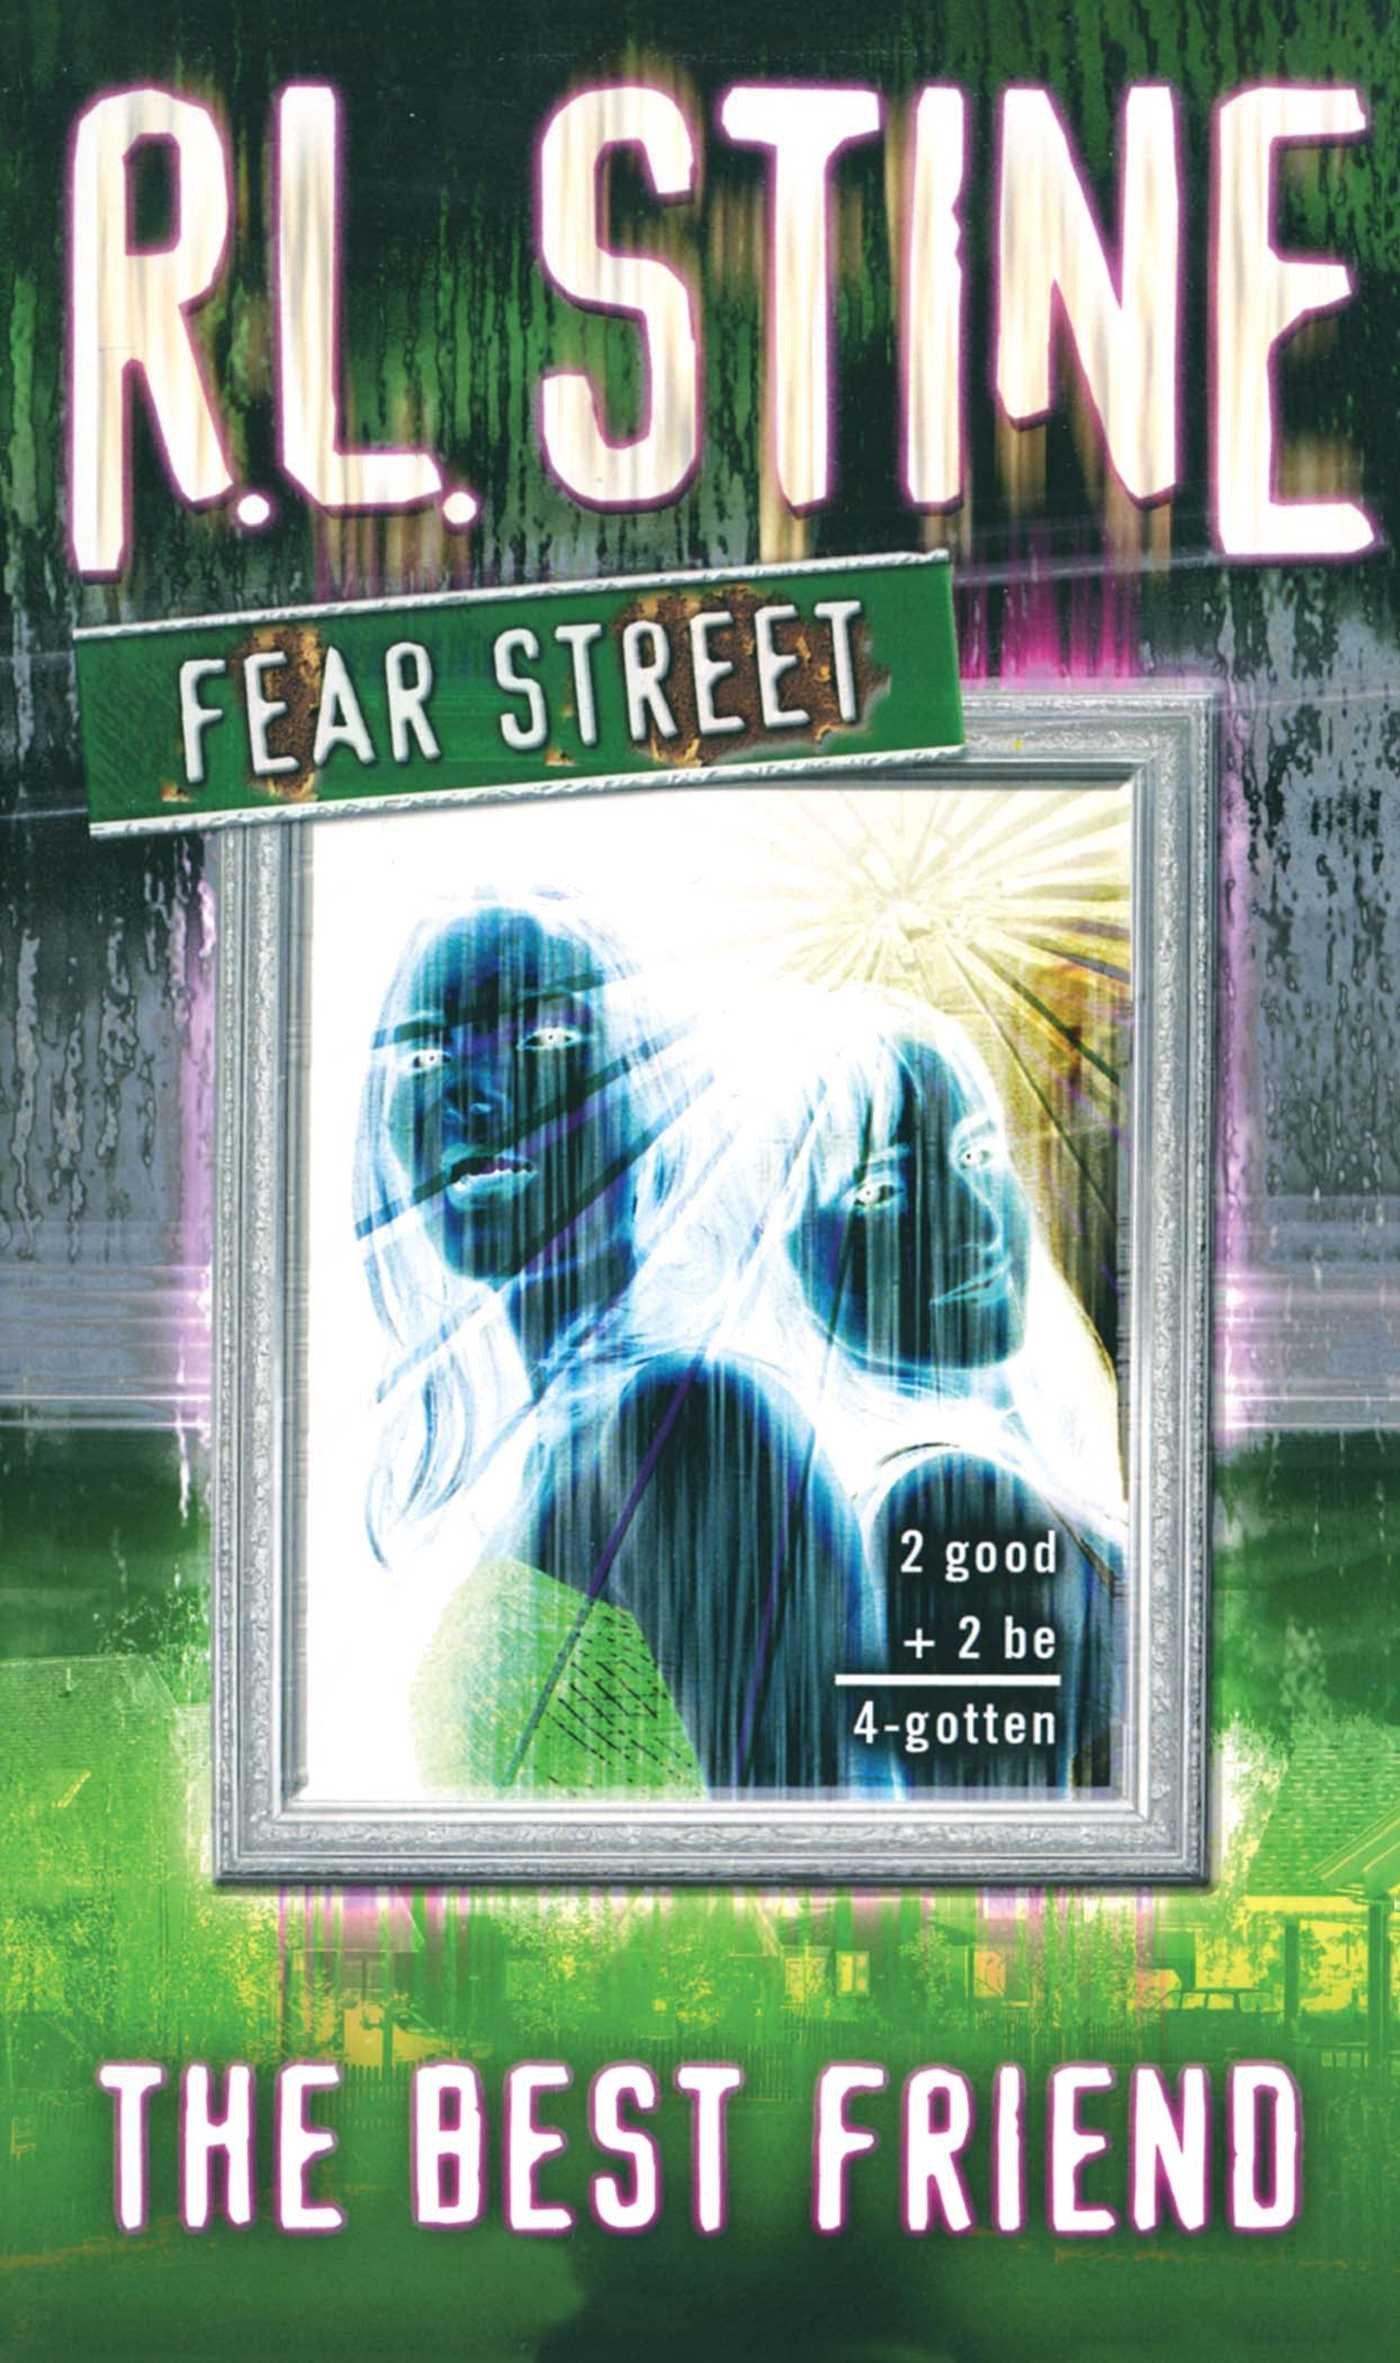 The Best Friend Fear Street 17 By Rl Stine